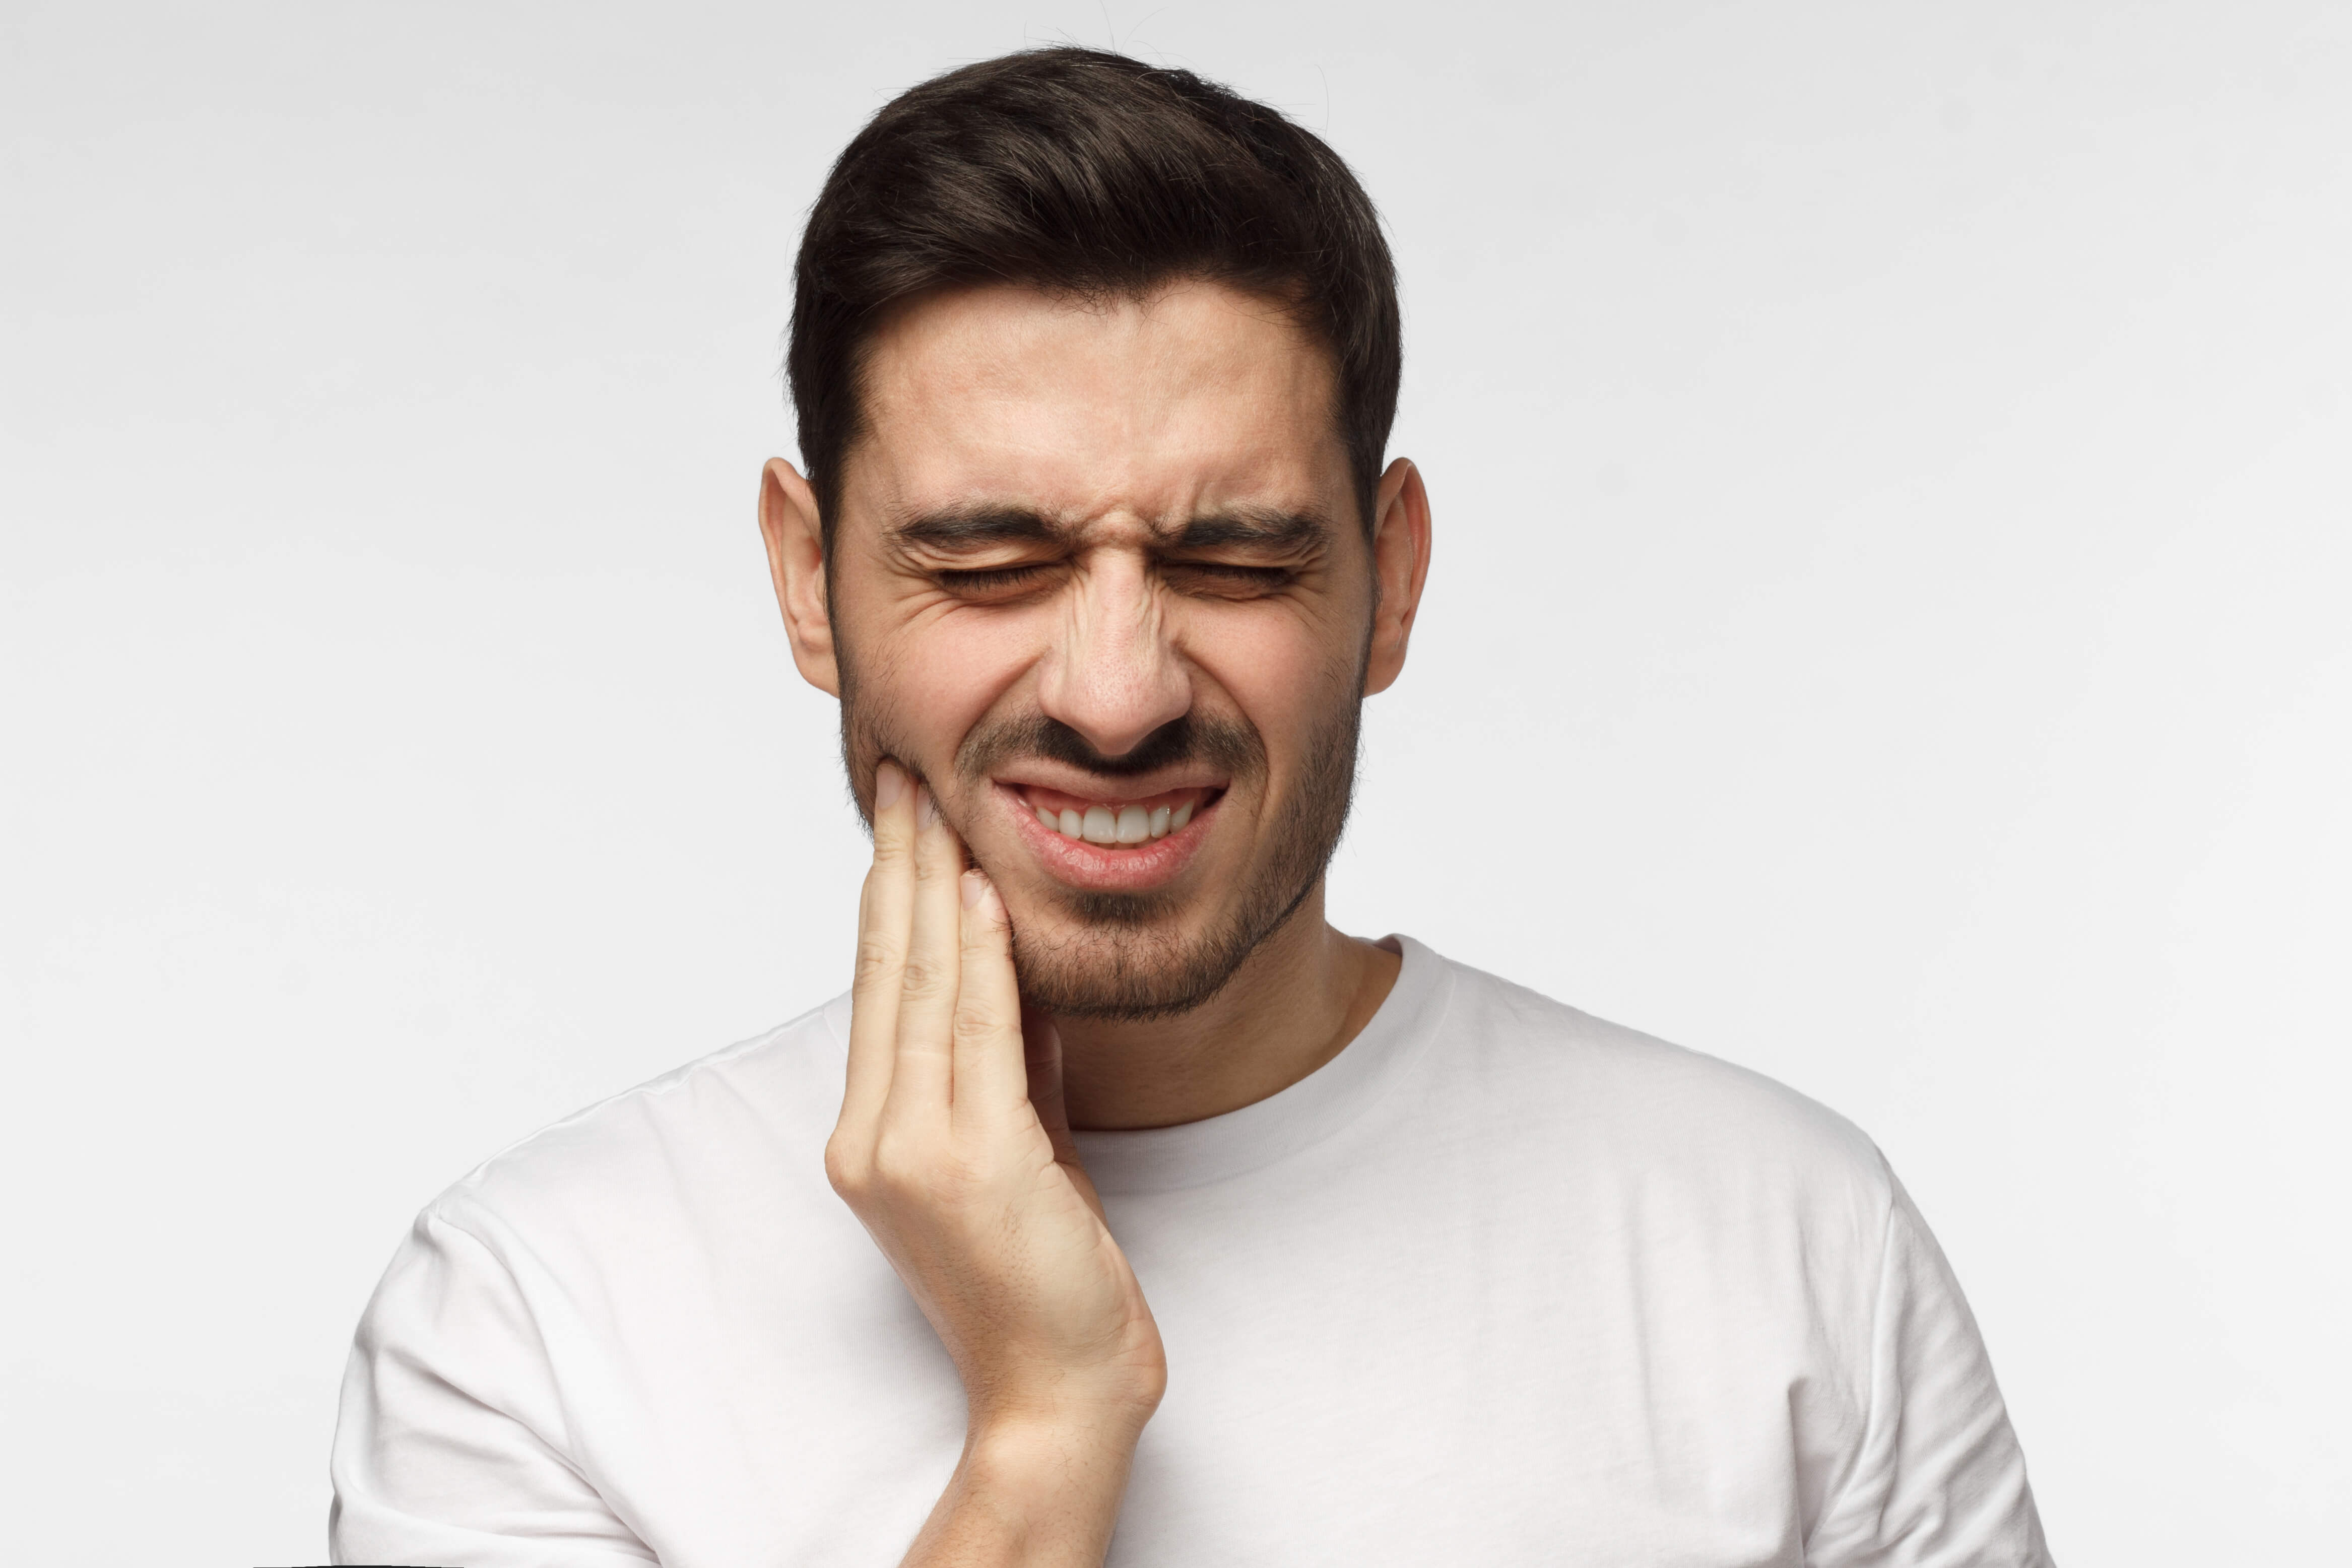 Treating TMJ Pain